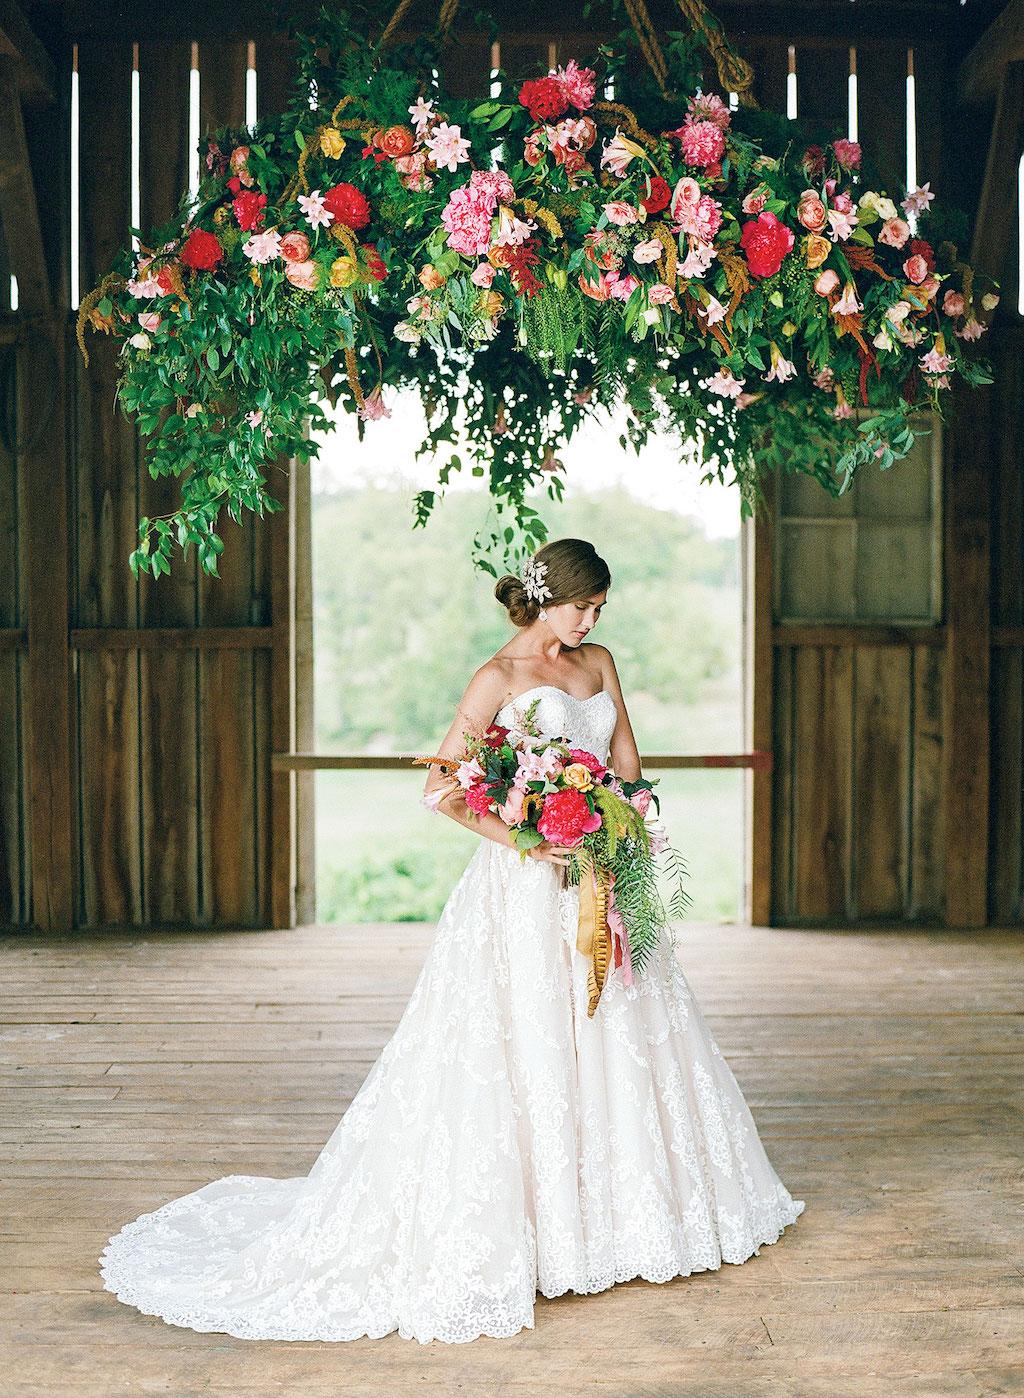 10-11-16-coolest-wedding-decor-design-10